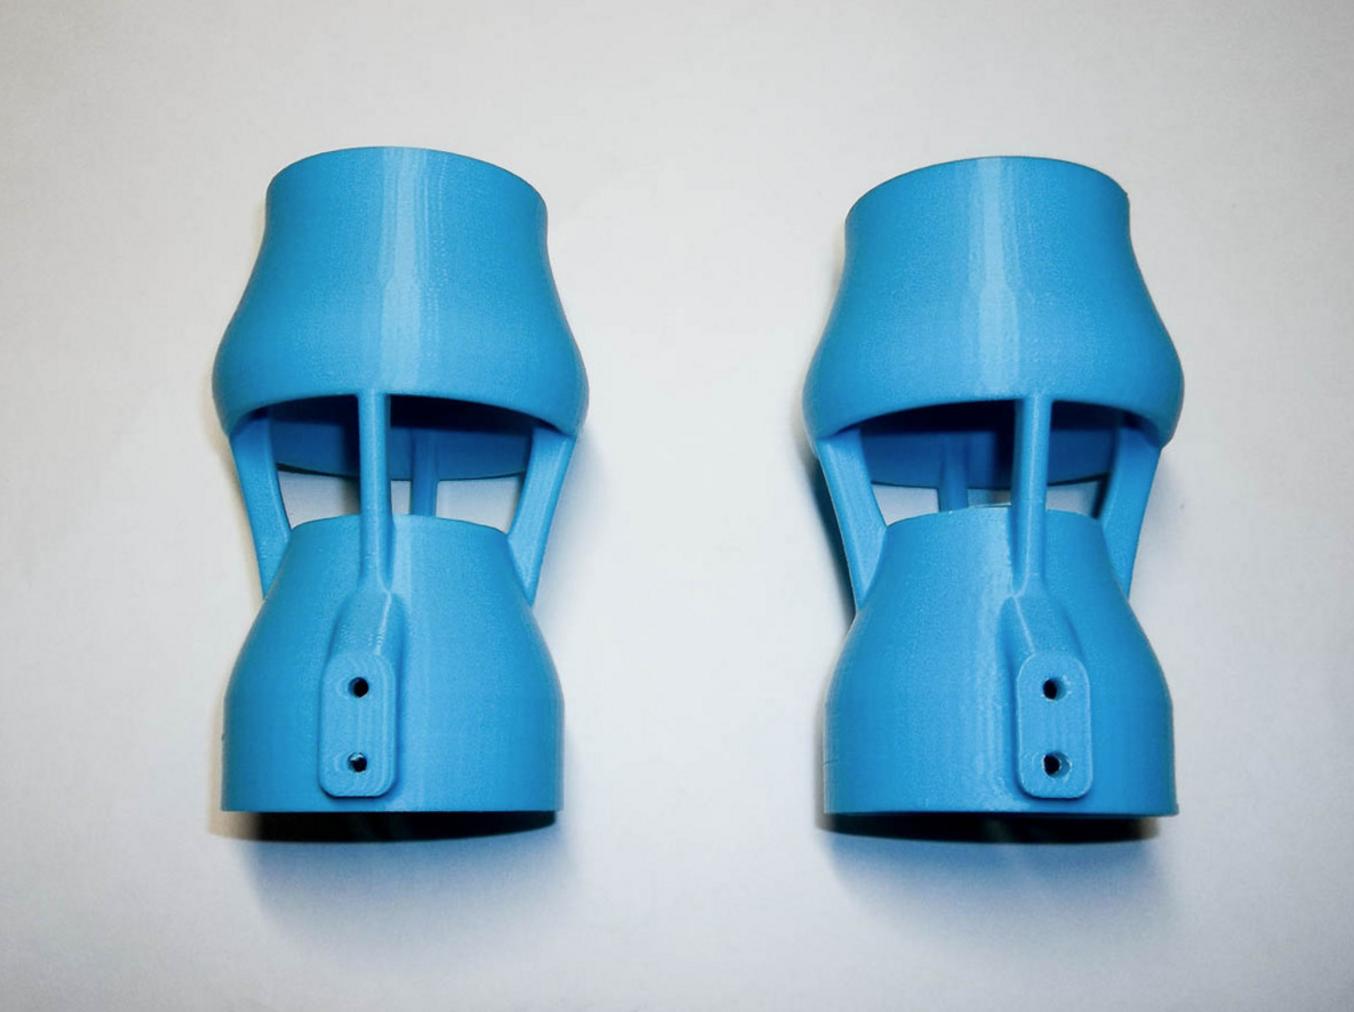 Capture d'écran 2016-10-11 à 09.37.26.png Download free STL file ROV Kort Nozzle for Bilge Pump Thruster w/Integrated Mount. • 3D printable design, sthone